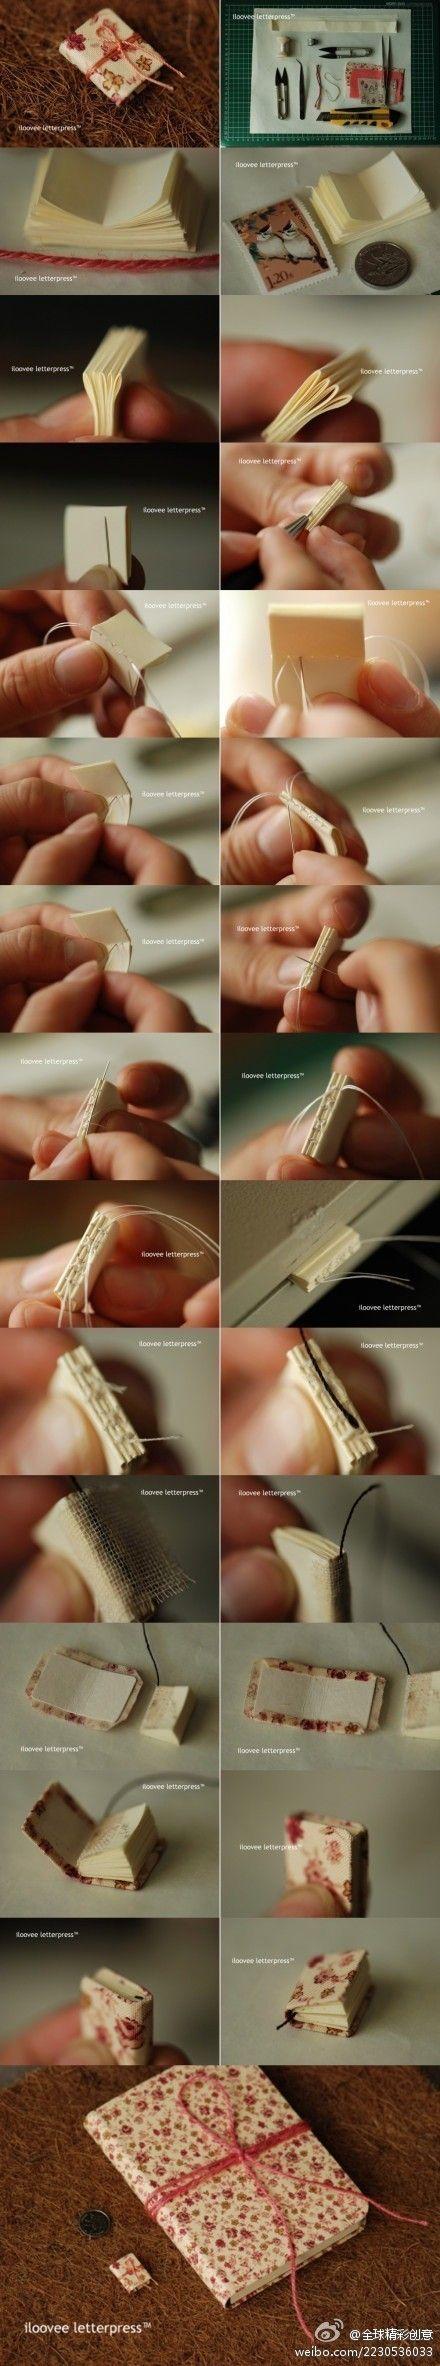 Cómo hacer libros en miniatura - how to make the little books